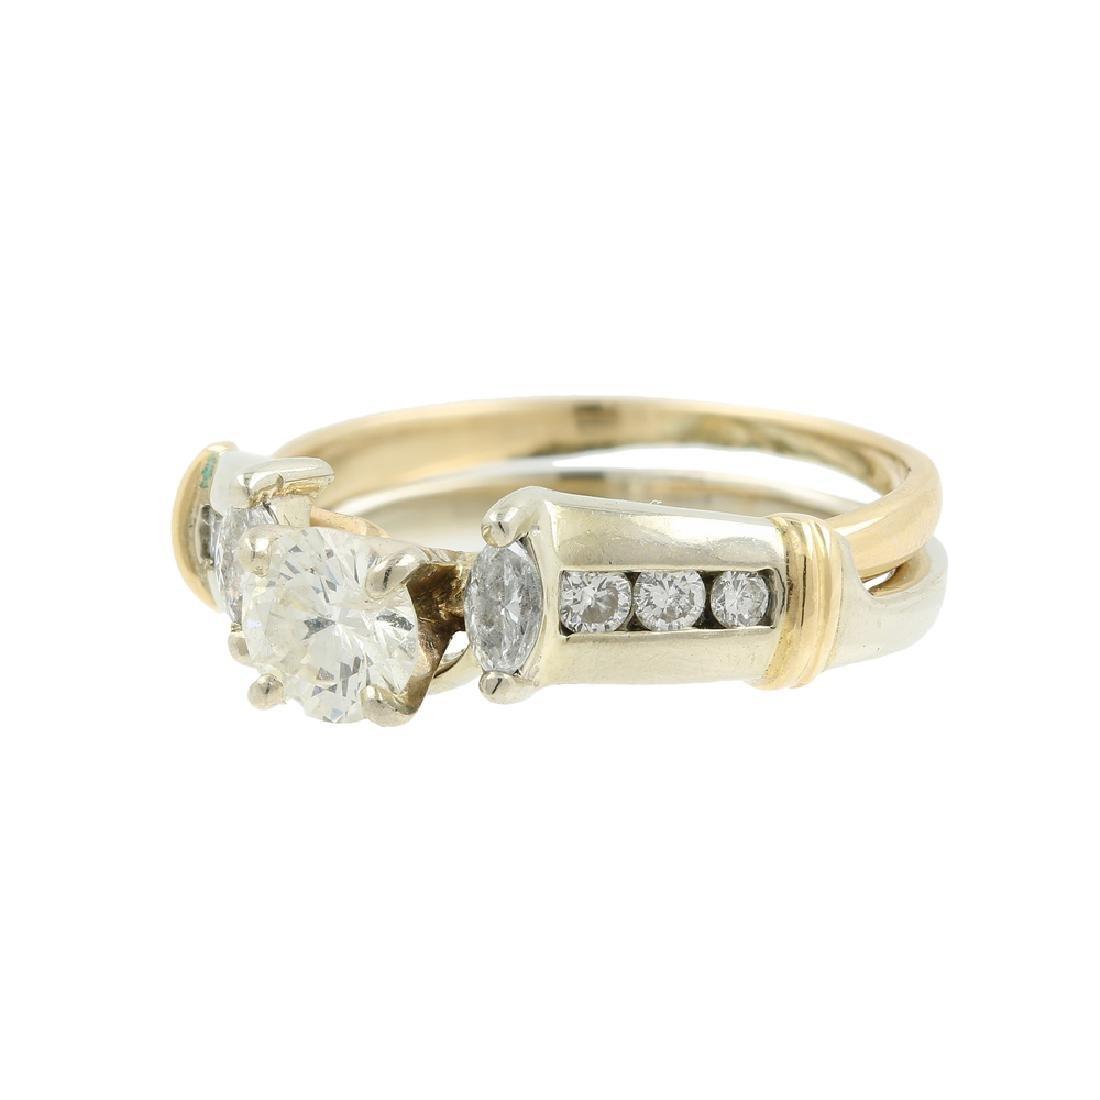 Ladies Estate 14K Yellow Gold Diamond Wedding Ring Two